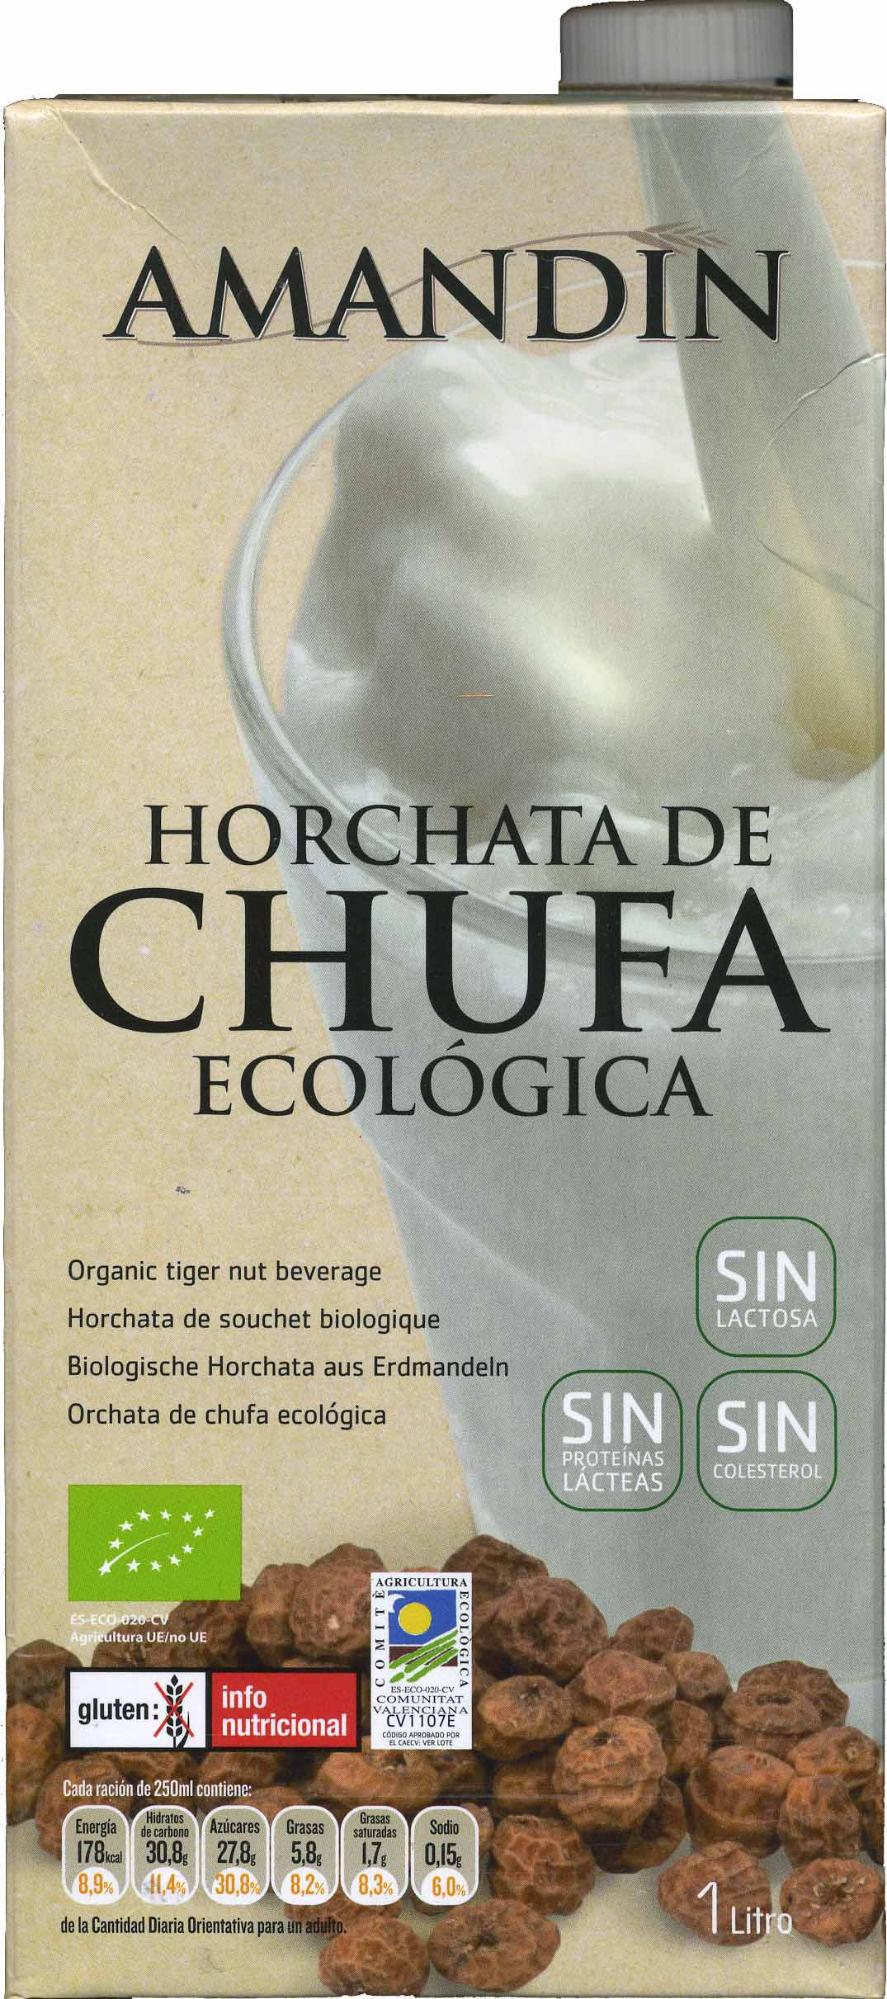 Horchata de chufa ecológica - Producto - es